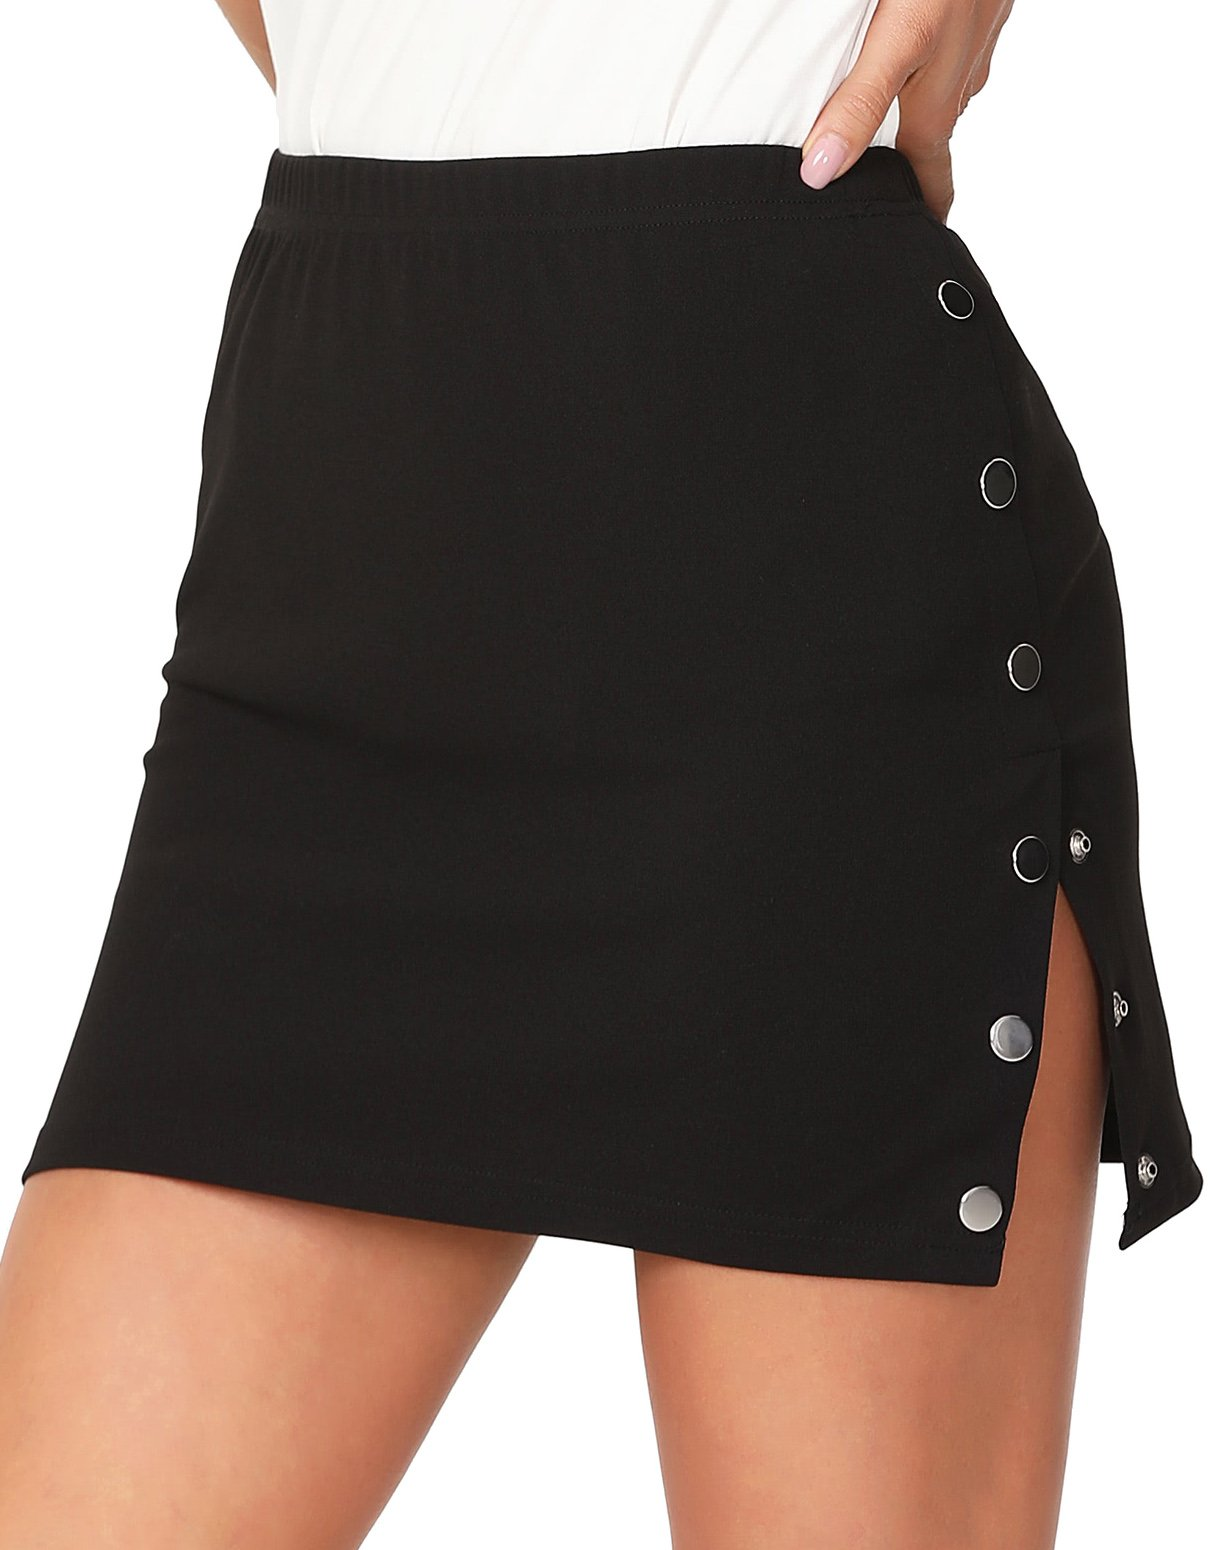 Floerns Women's Buttoned Side Fitting Skirt Black L